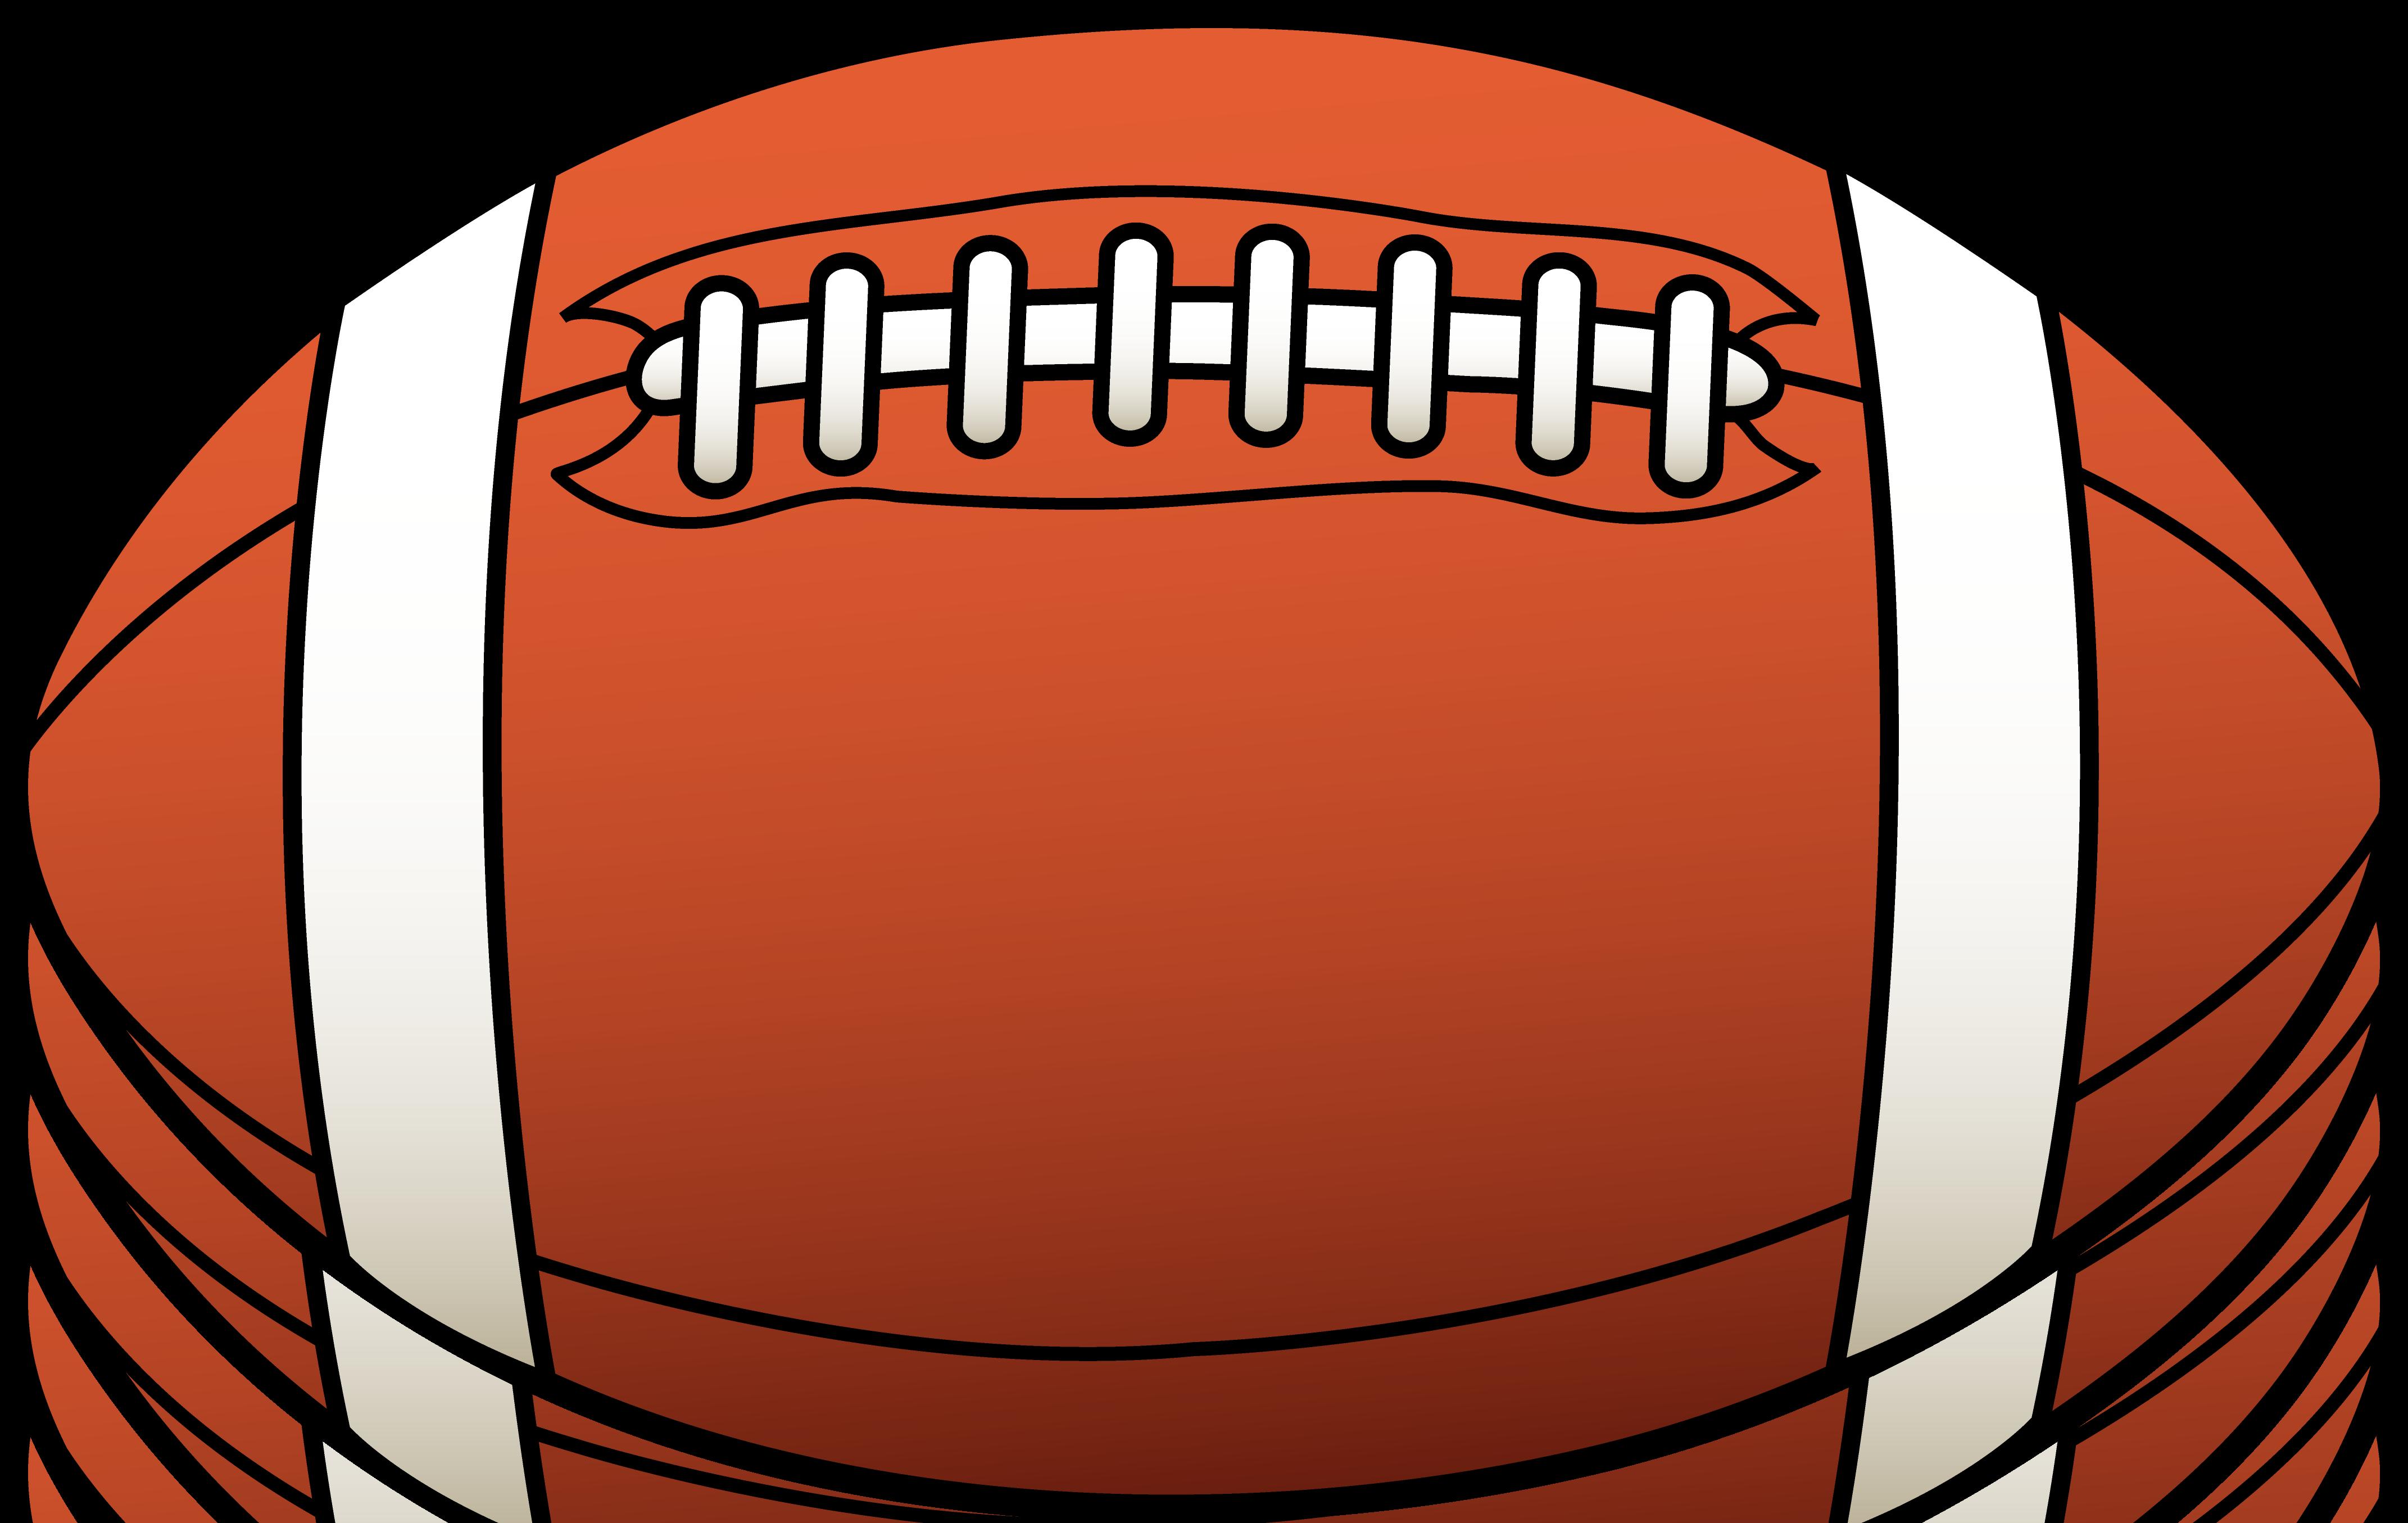 4285x2710 Sports Balls Clipart